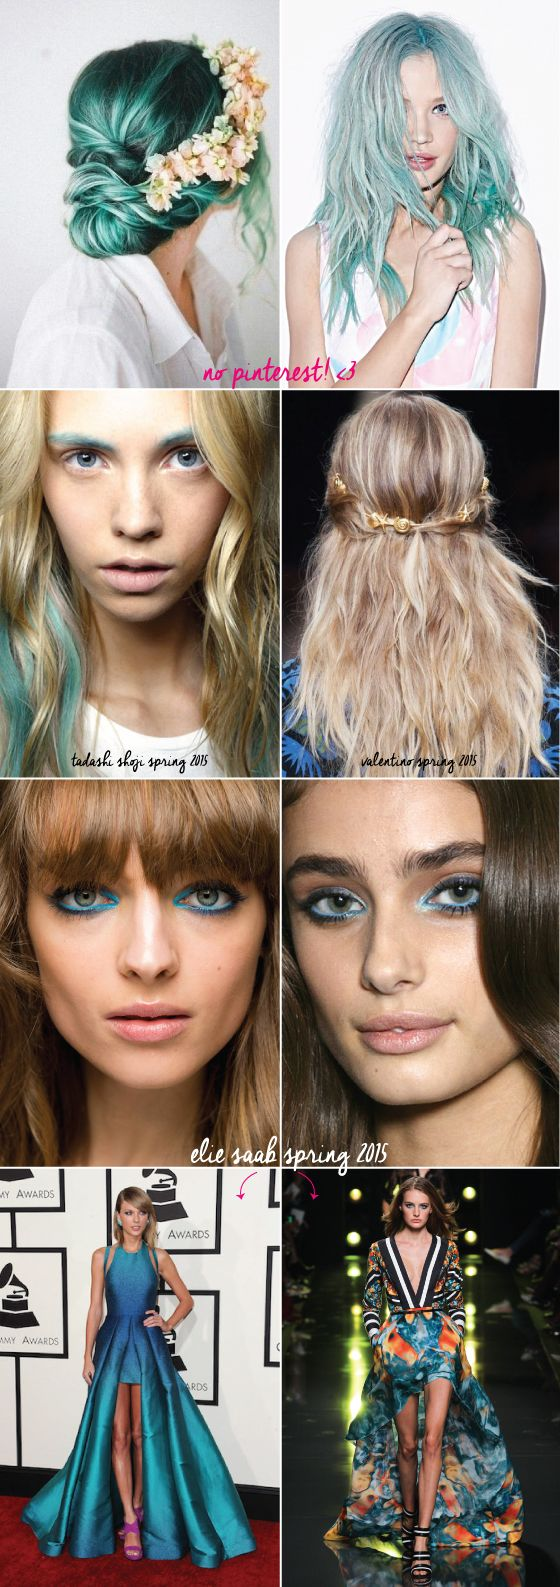 sereia-sereismo-tendencia-seapunk-wildfox-biquini-concha-tendencia-trend-mermaid-fashion-taylor-swift-elie-saab-cabelo-hair-pinterest-green-azul-blue-verde